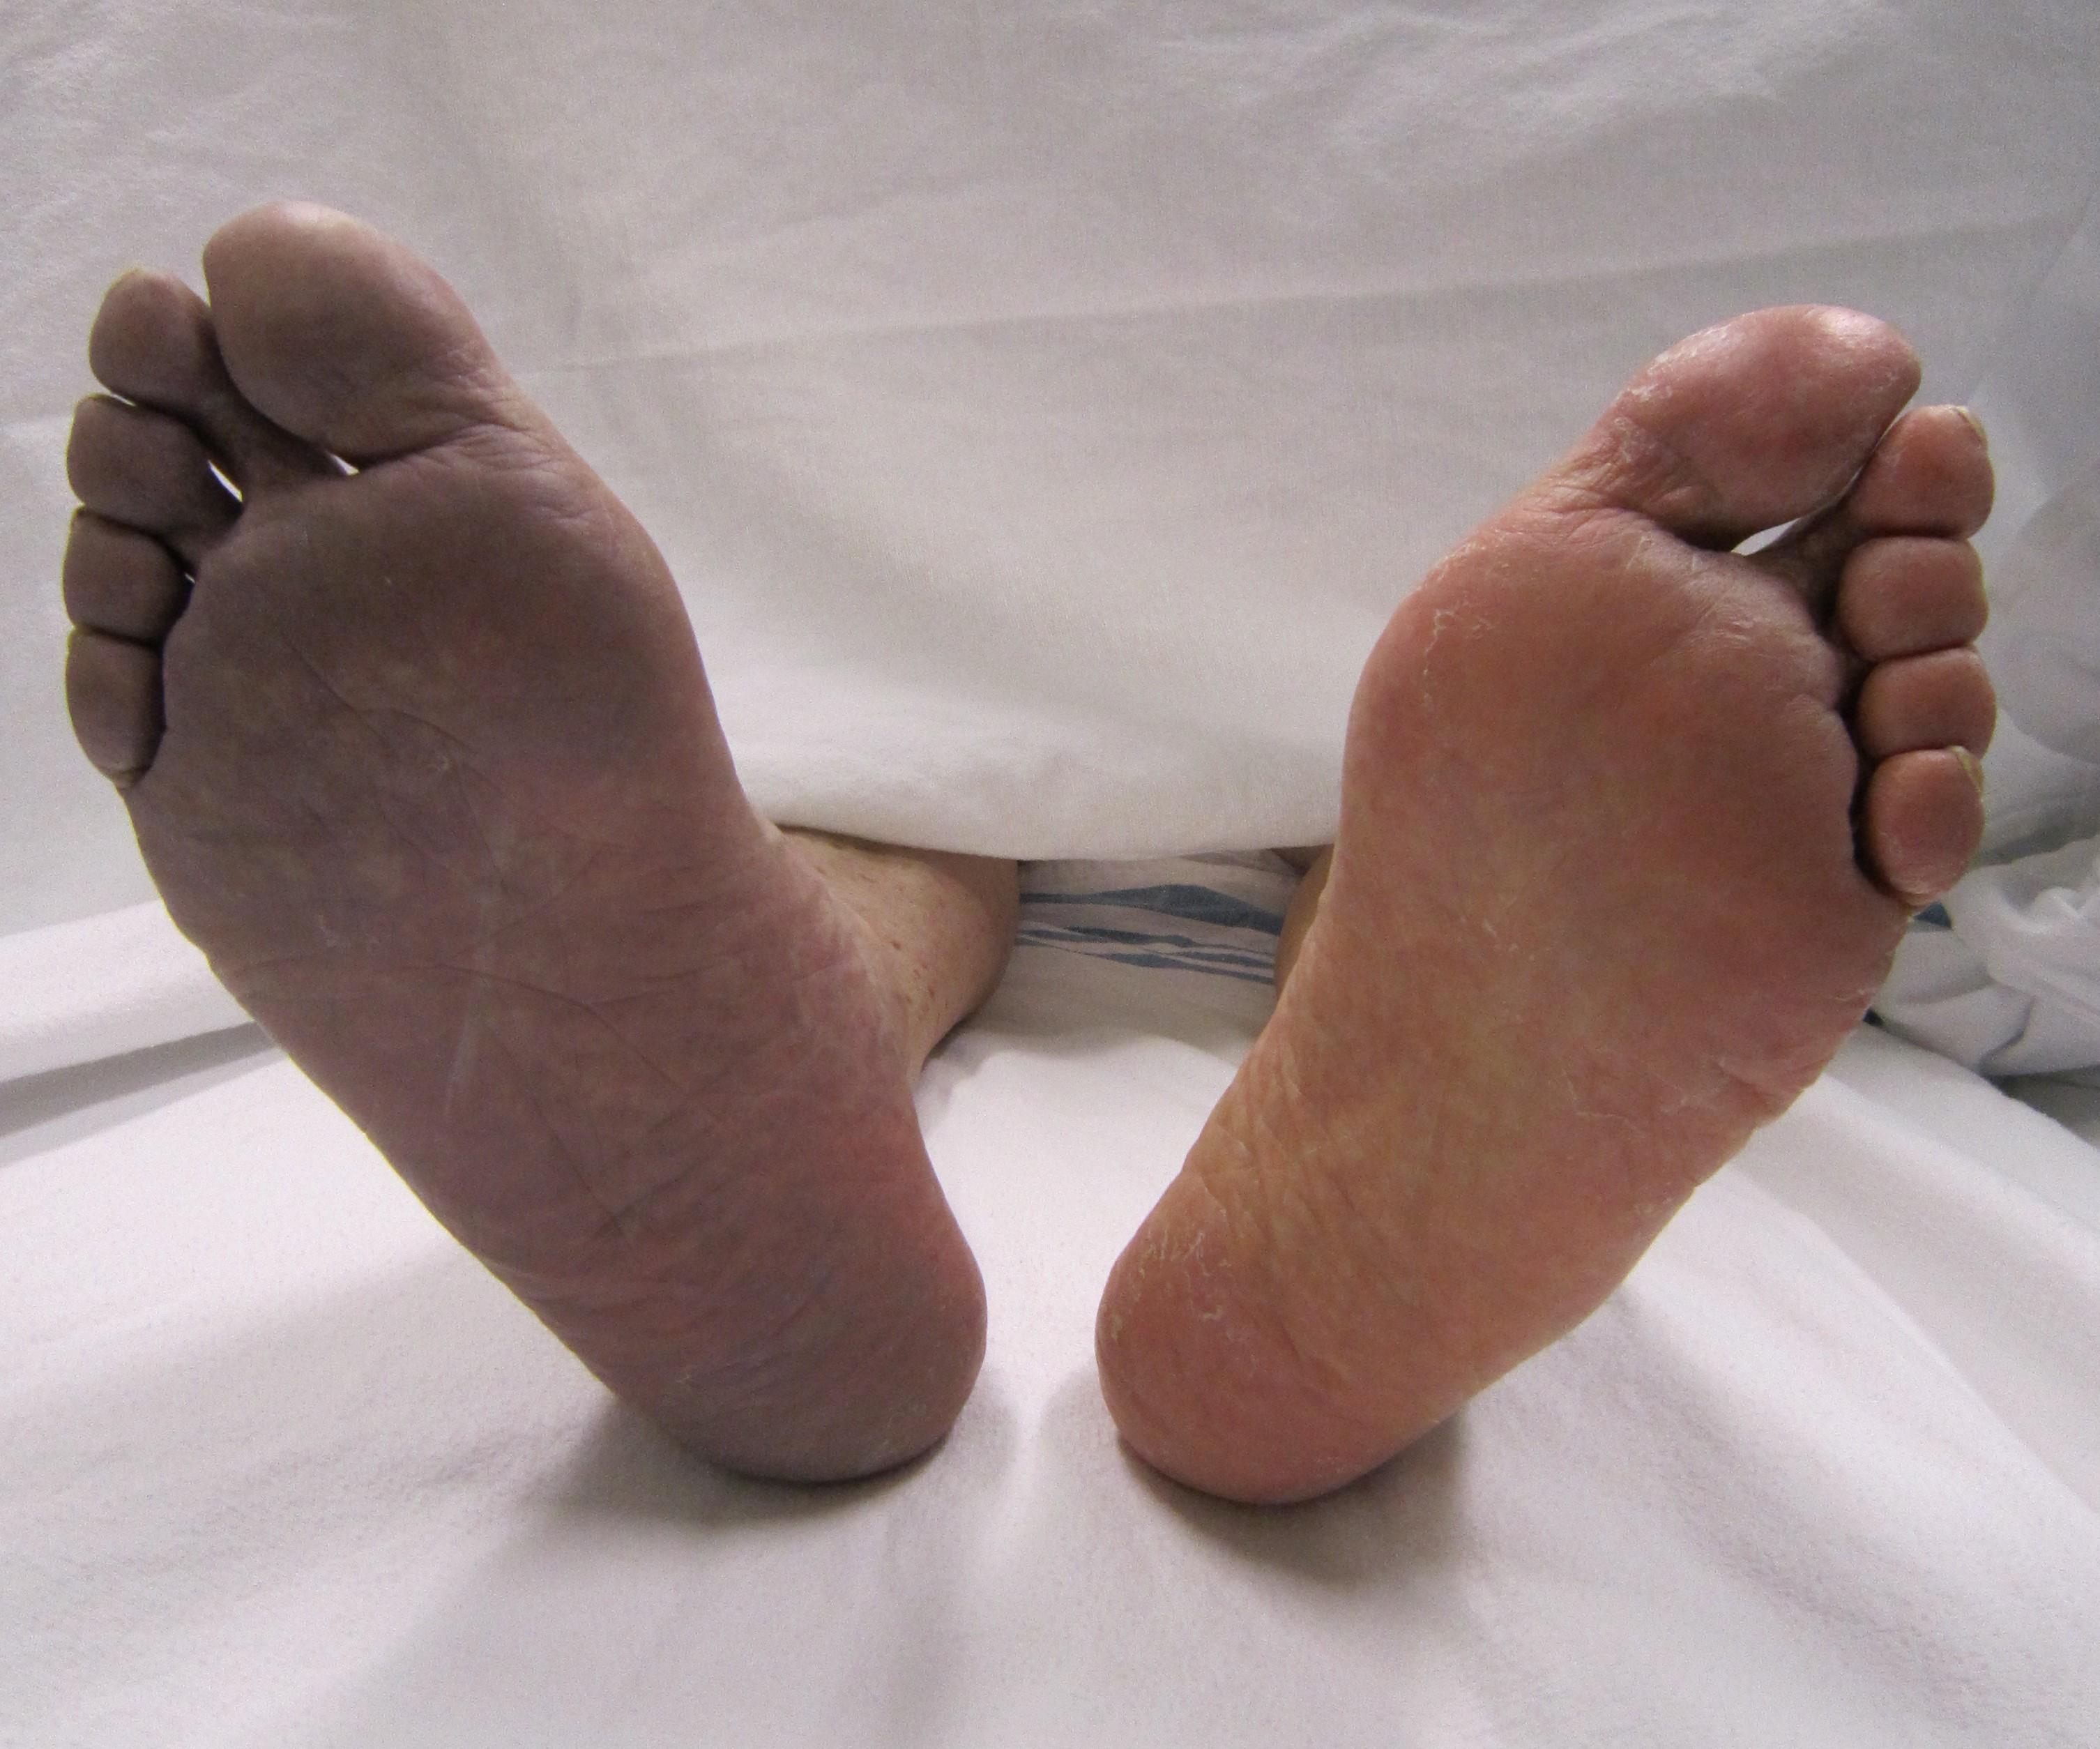 sintomas trombosis venosa profunda brazo